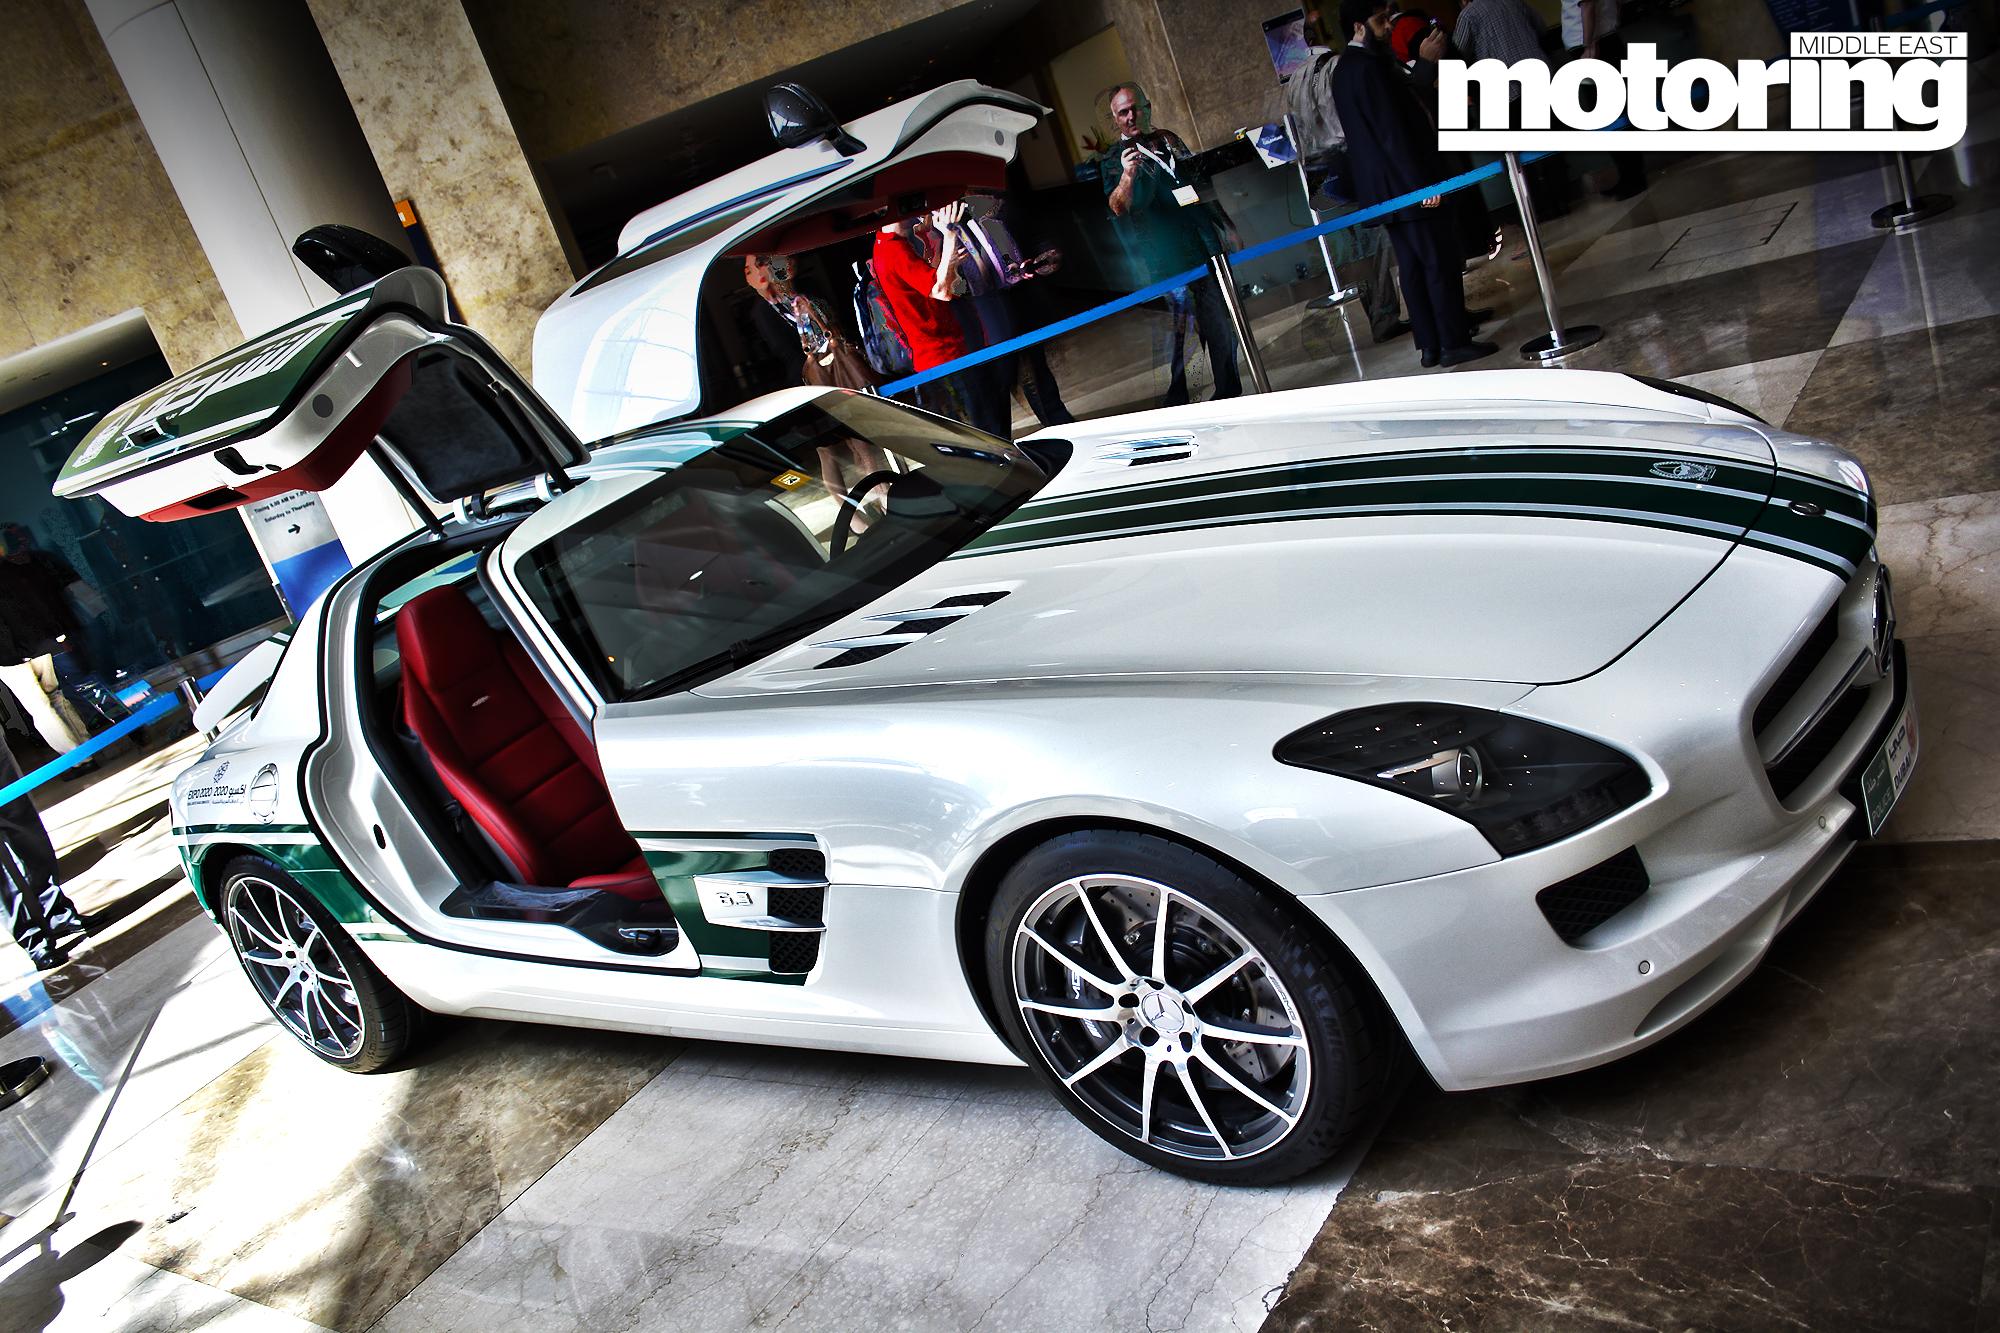 Used Cars Under 10000 Near Me >> We Sell Police Cars.html   Autos Weblog